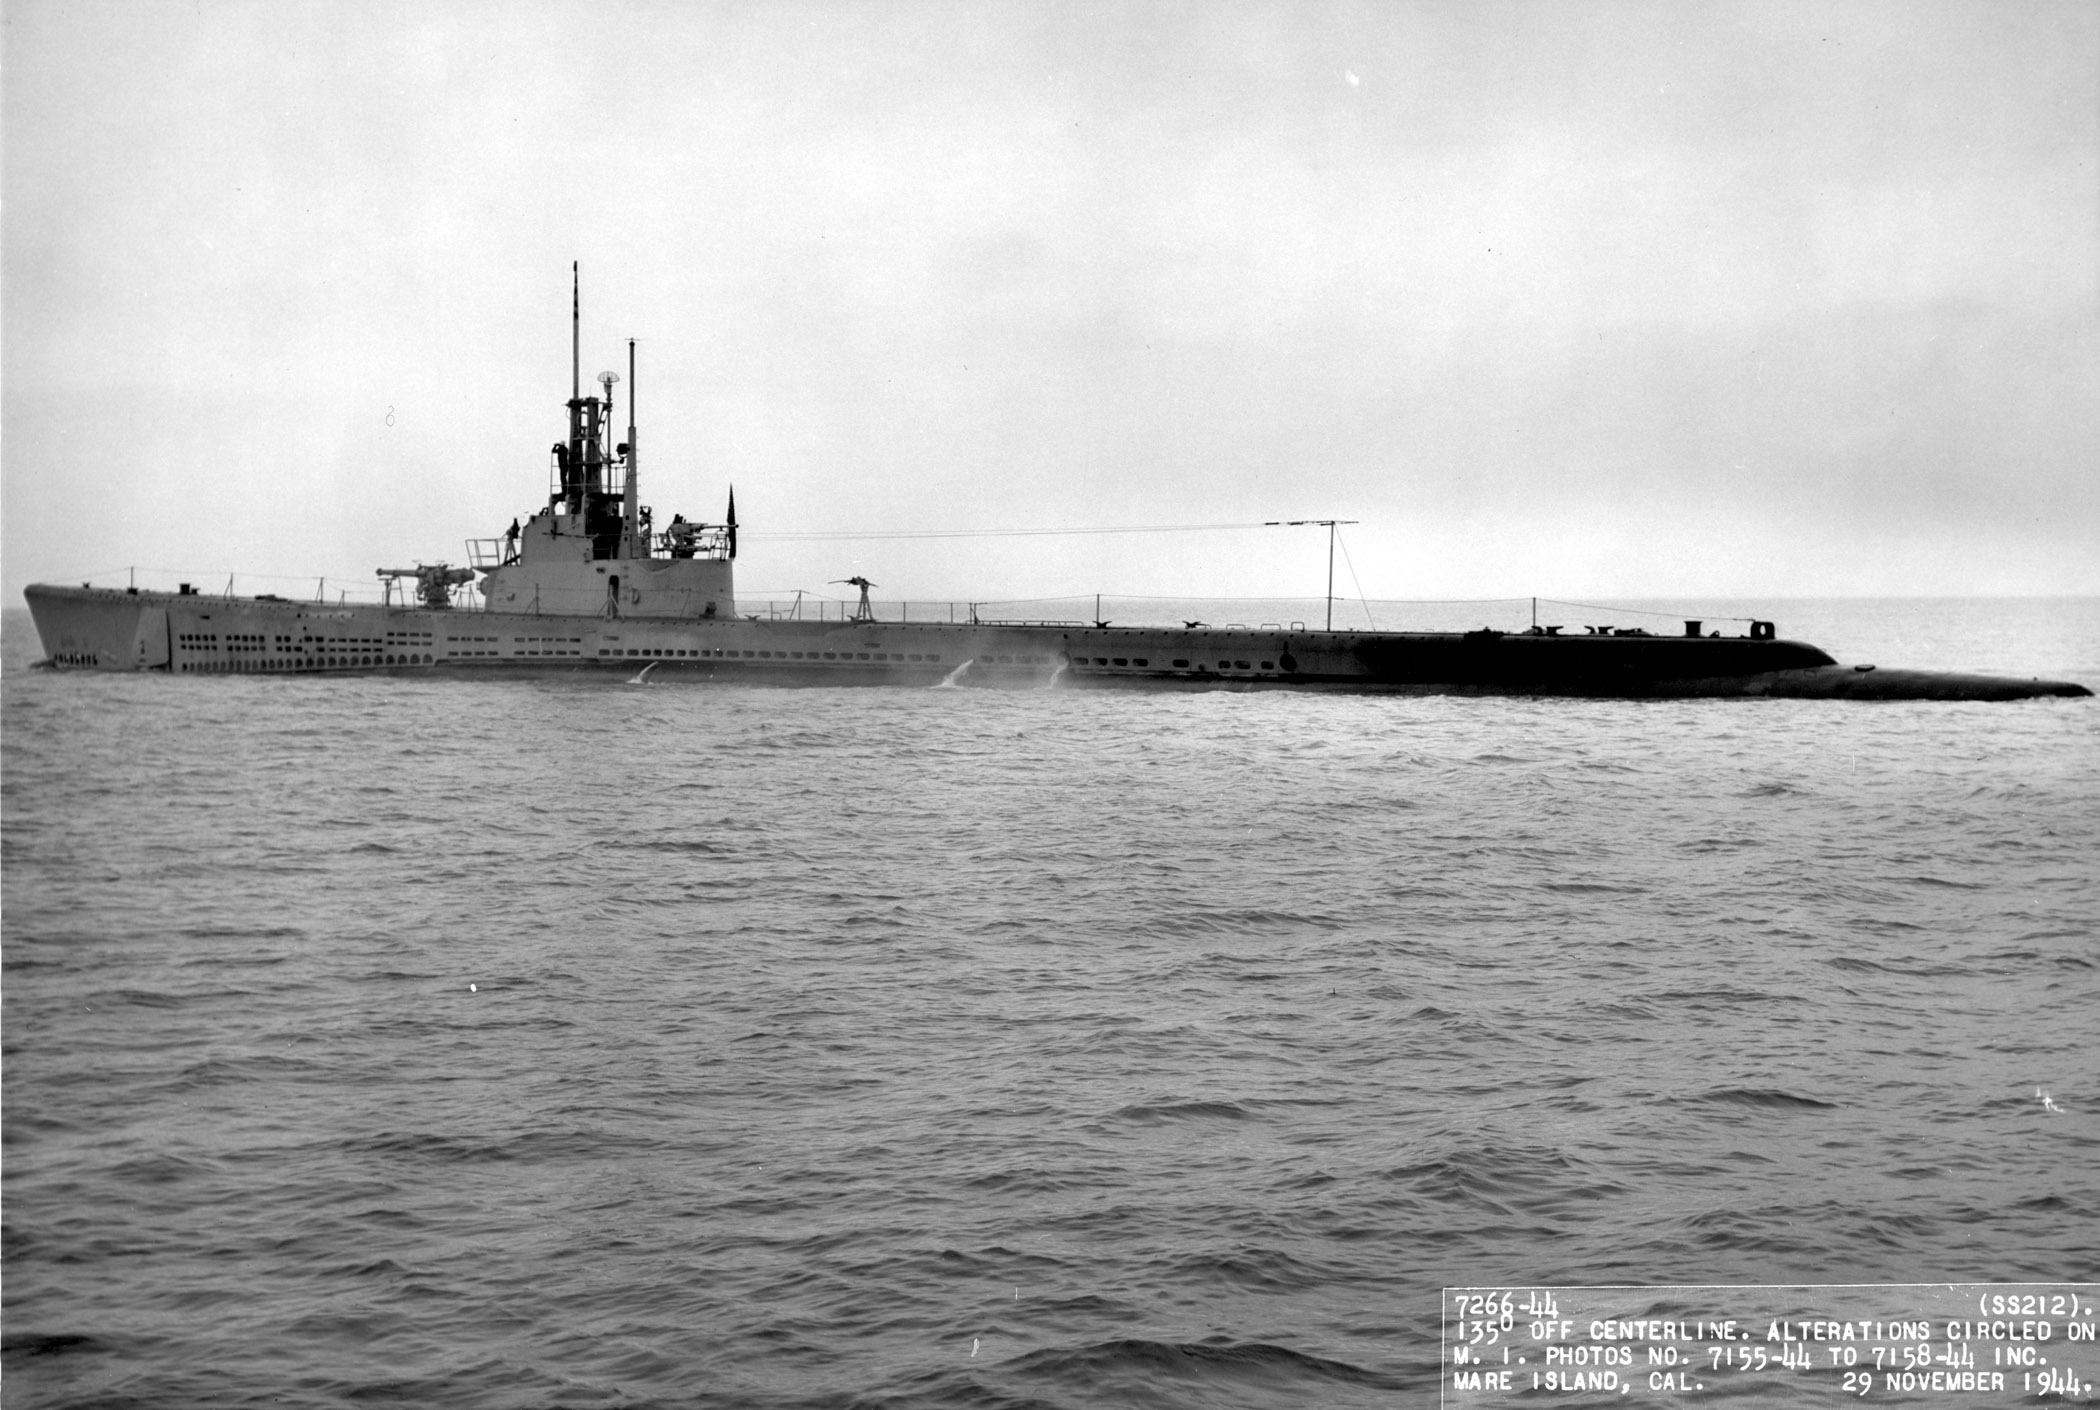 Boat Sailors: Vietnam War action by fleet submarines